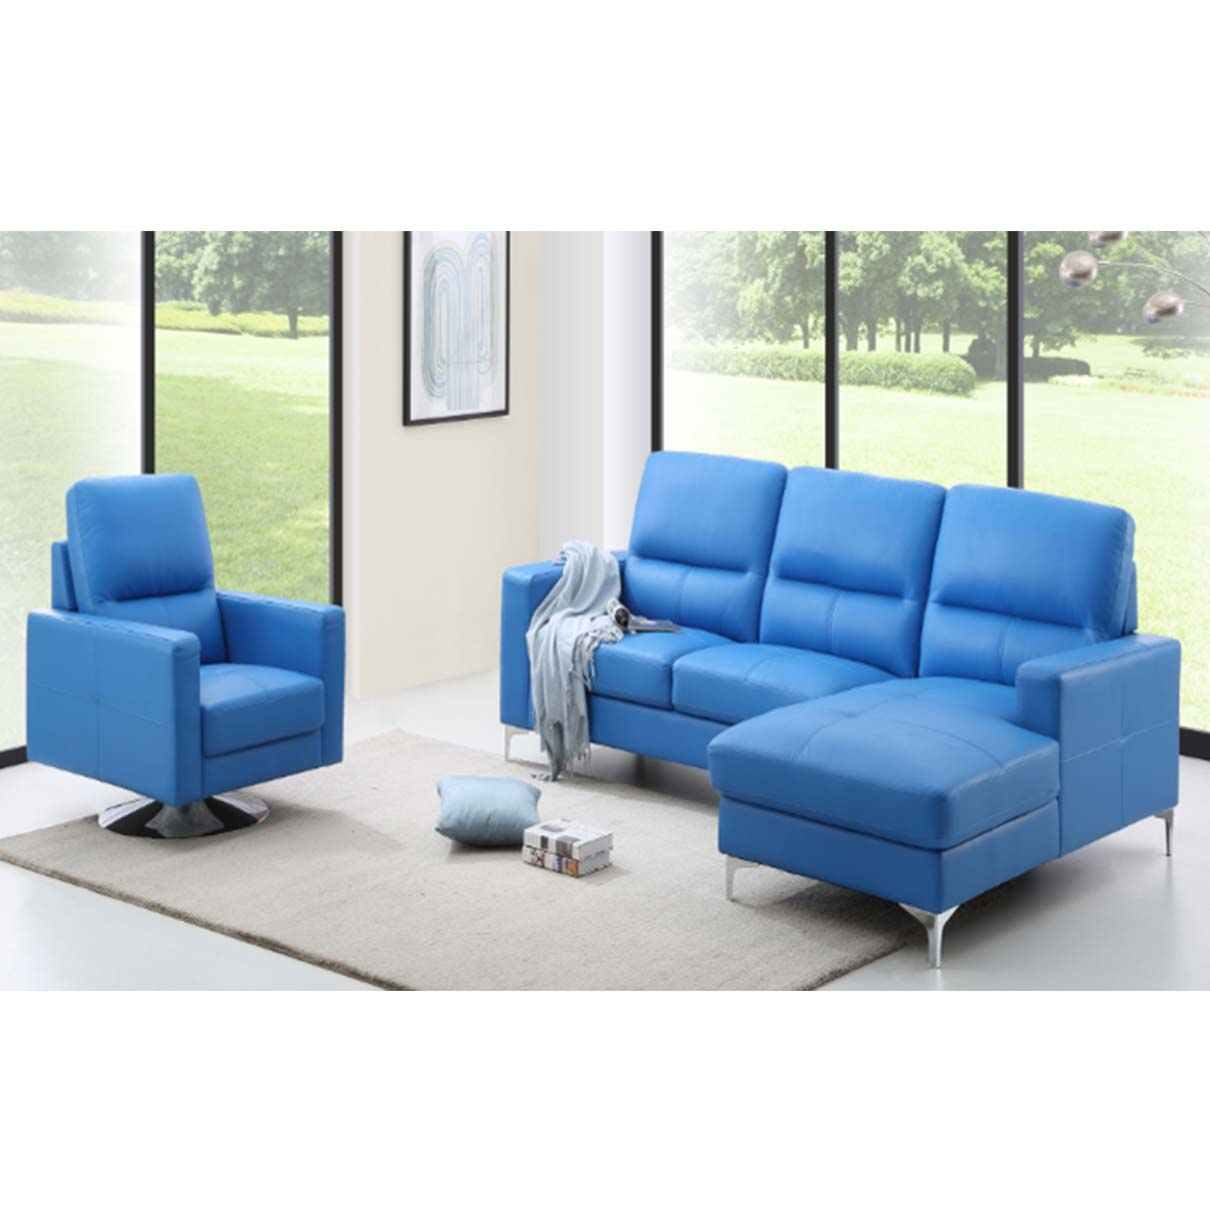 g19 decor and design lounge